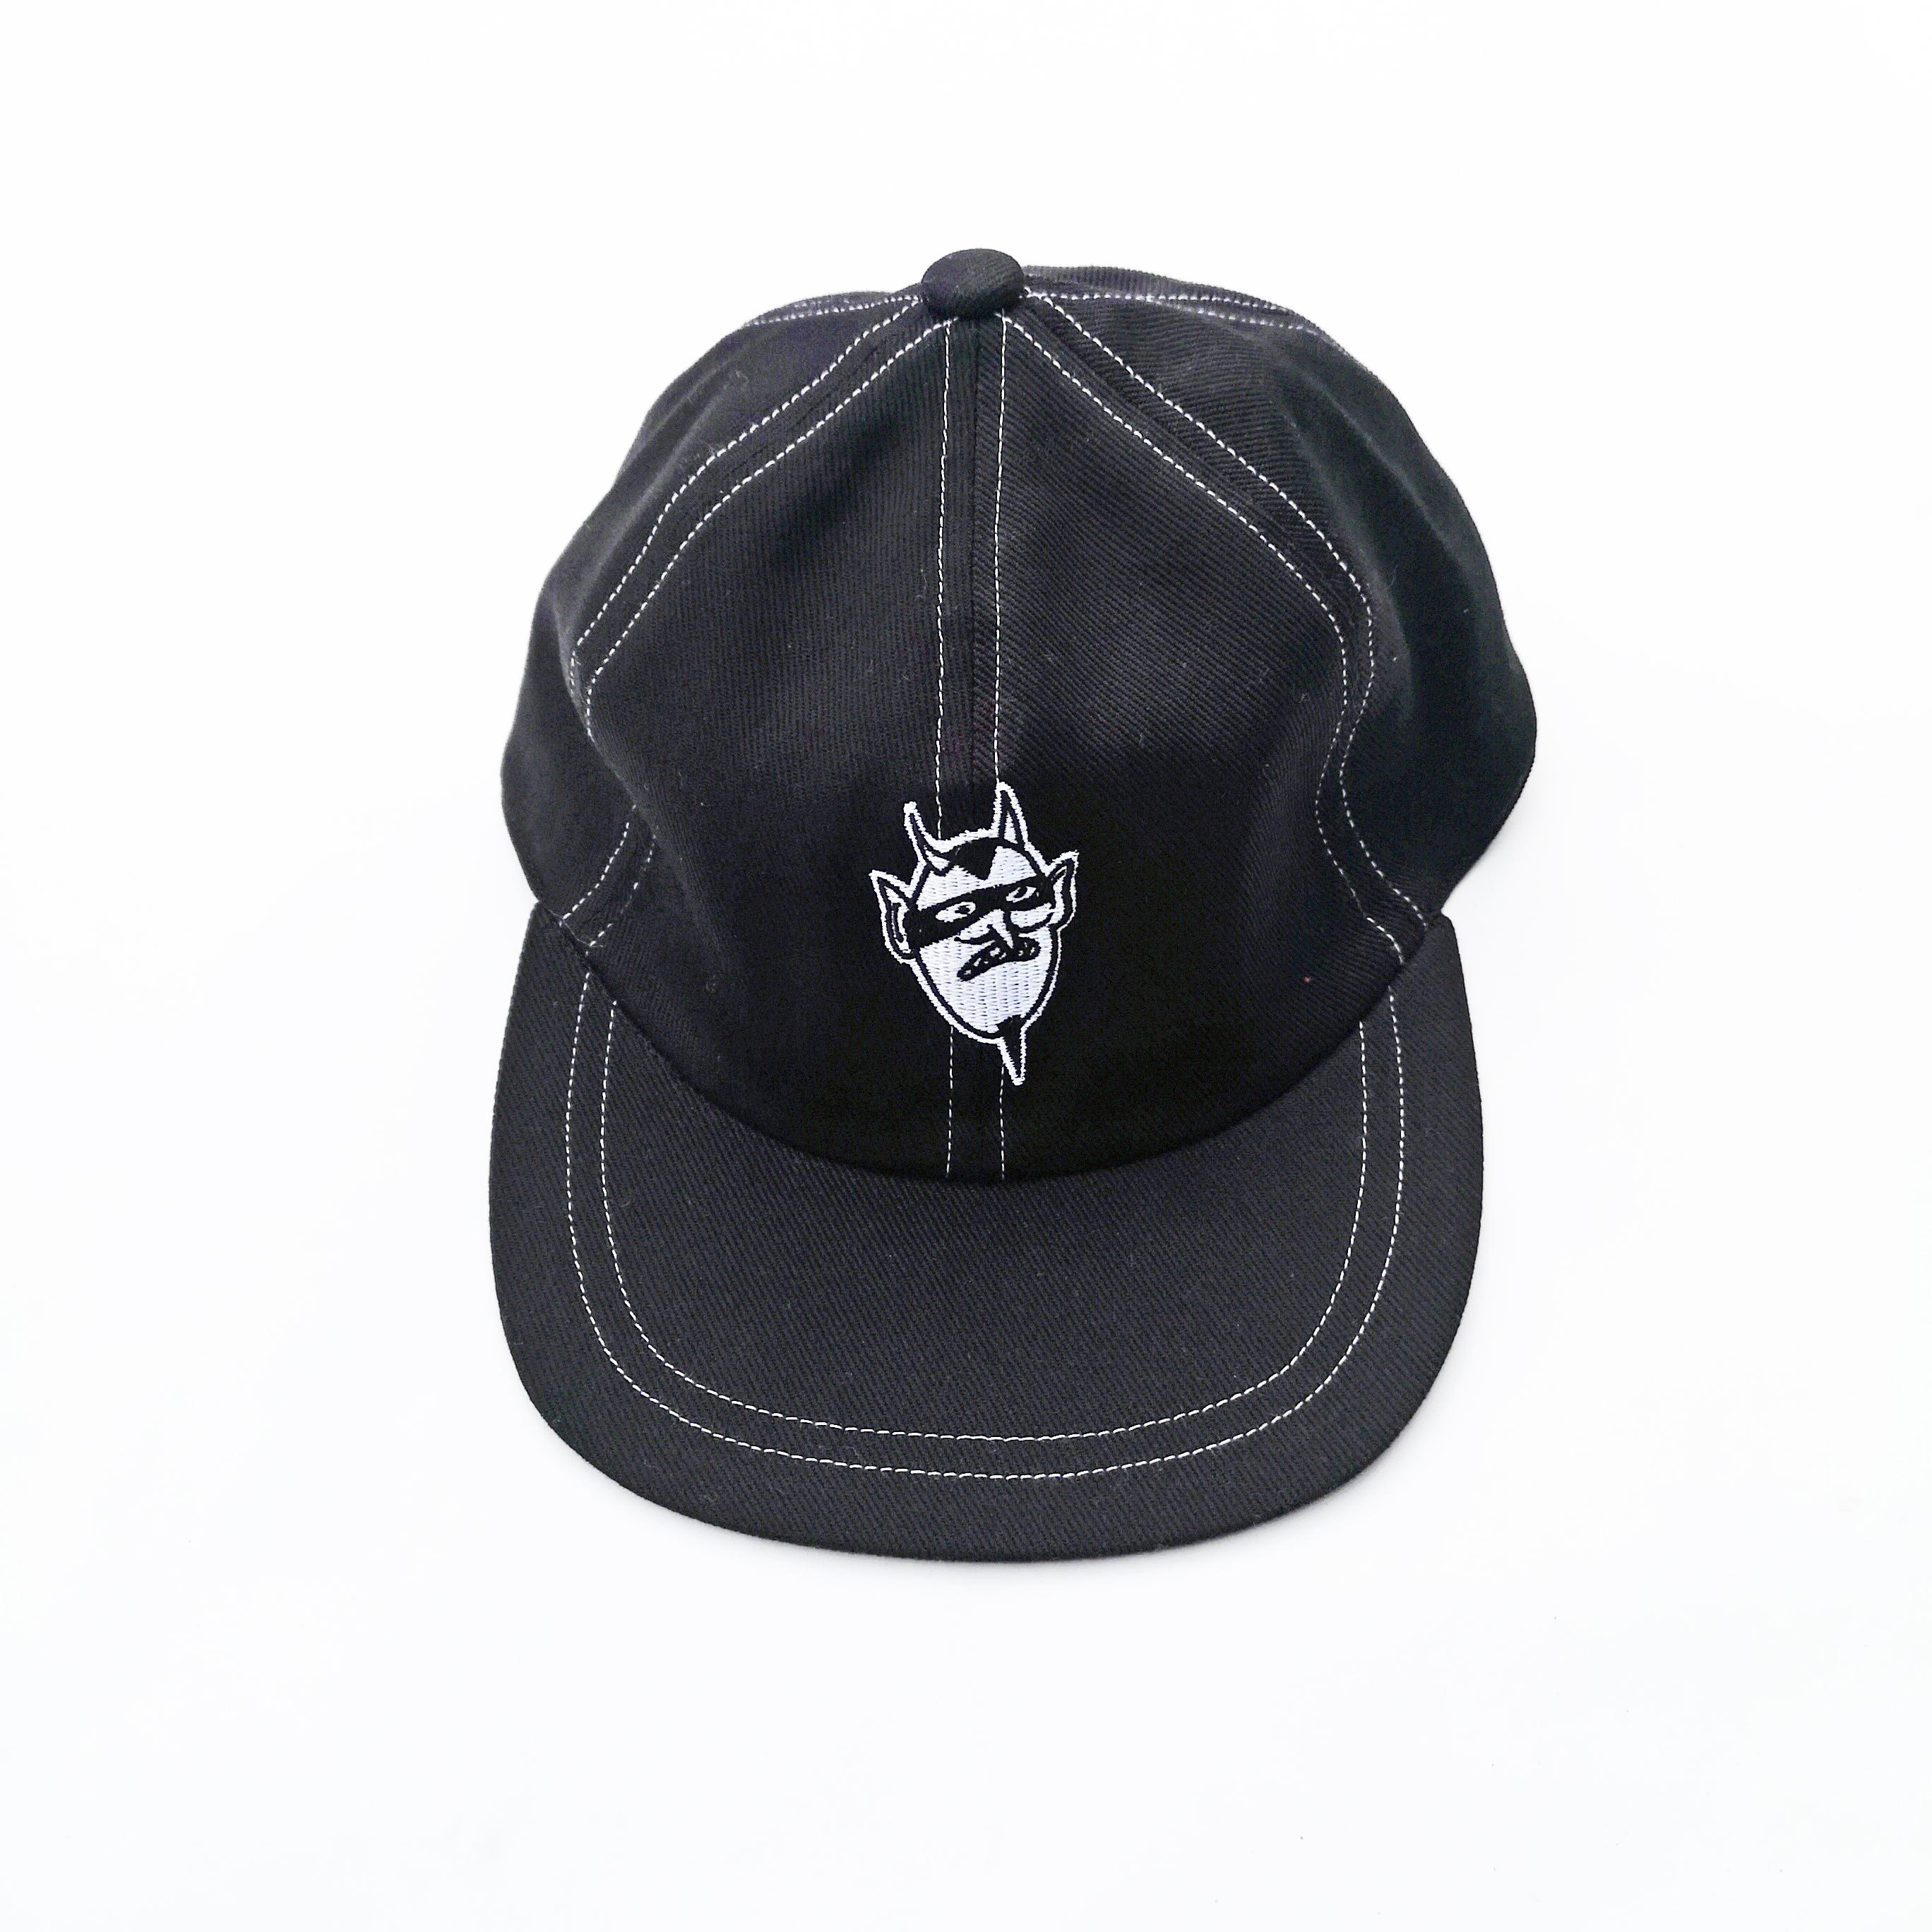 PRANK DEVIL BLACK WHITE STITCH CAP